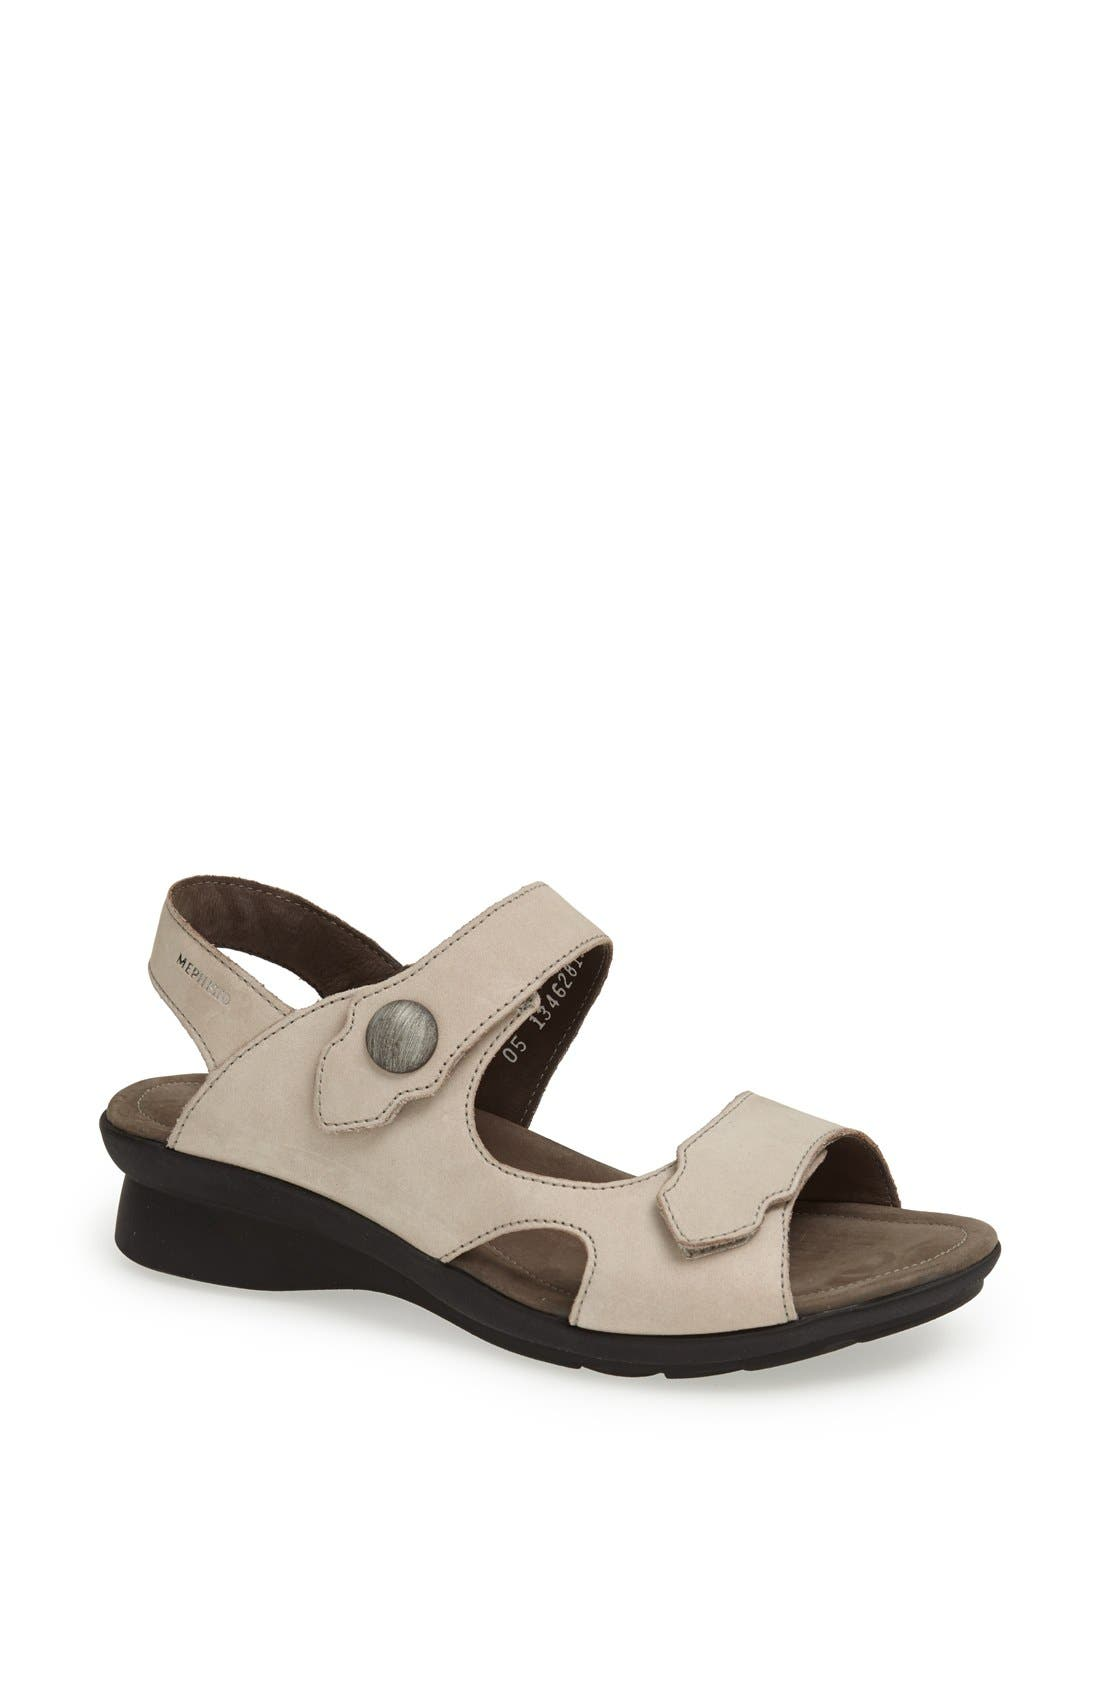 Mephisto 'Prudy' Leather Sandal